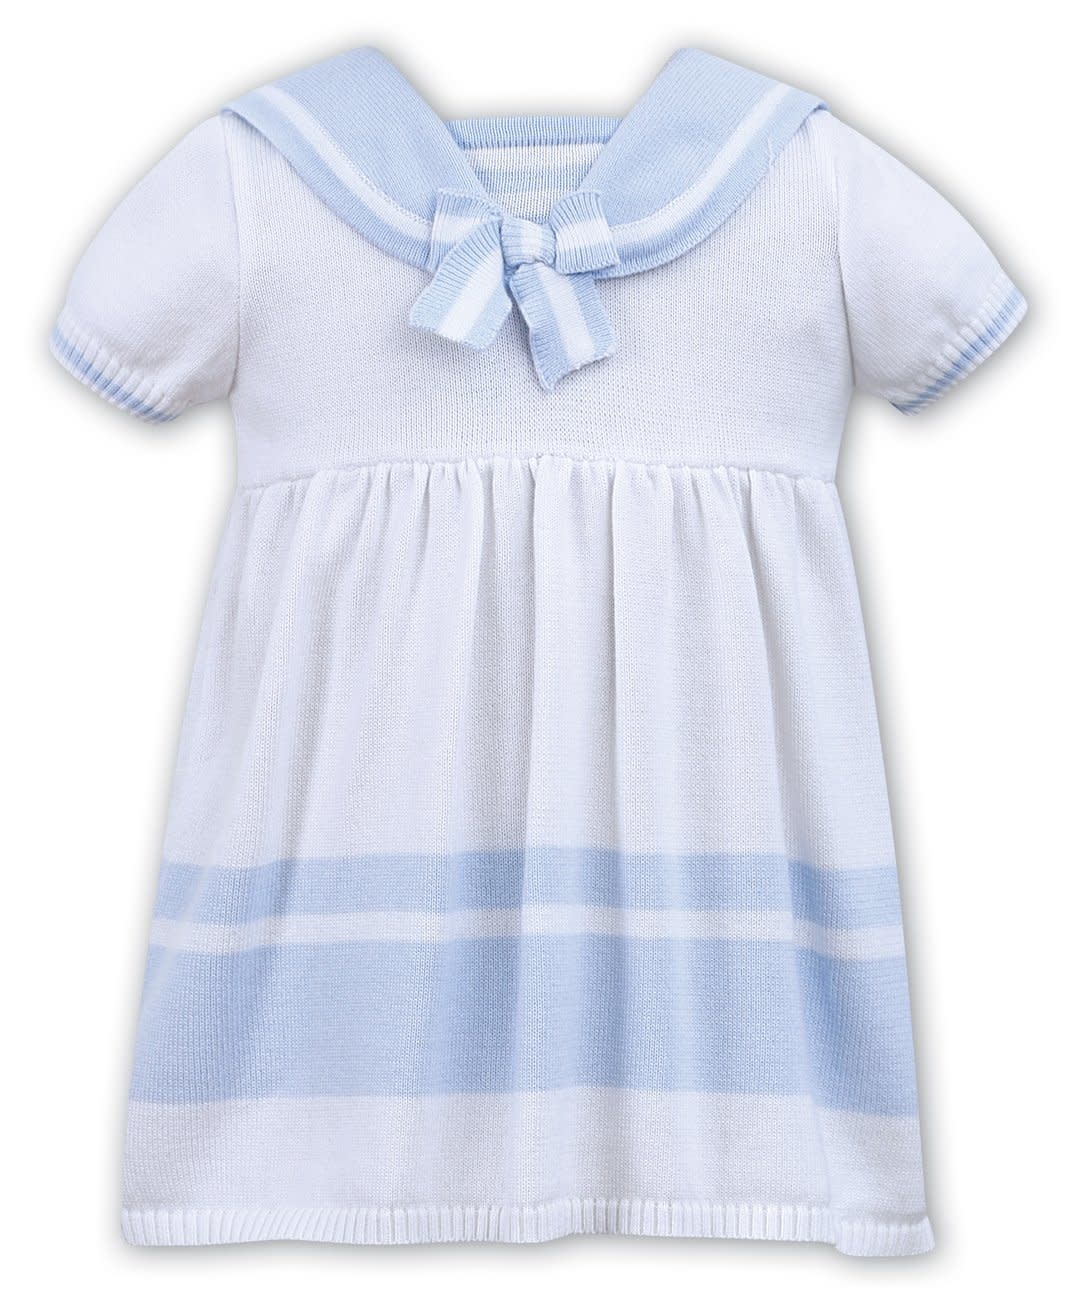 Sarah Louise DANI D09333 WHITE BLUE DRESS